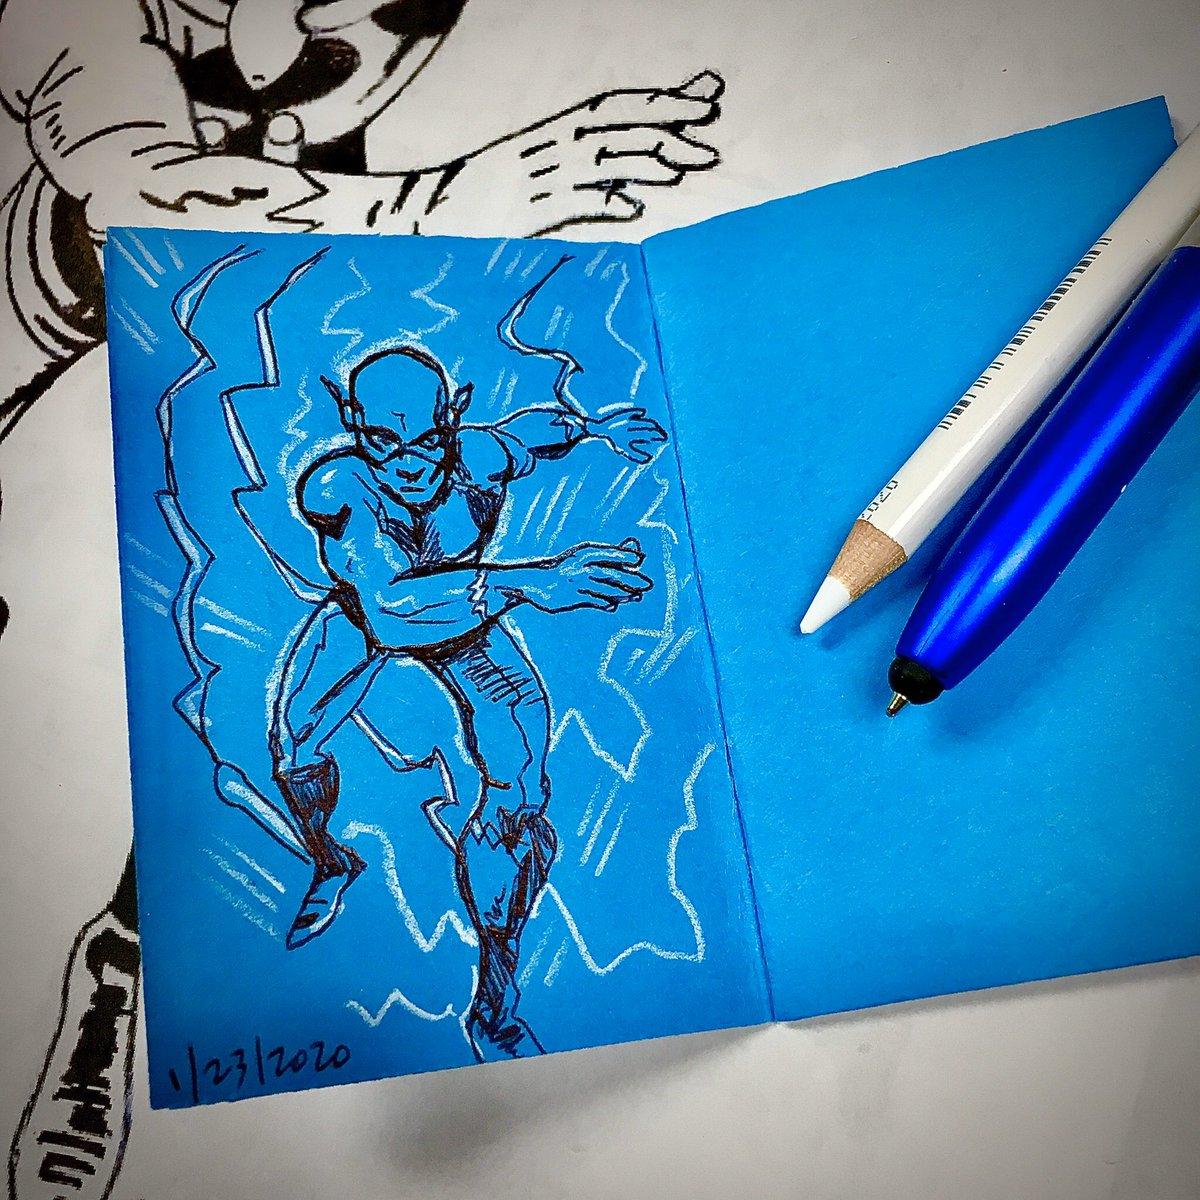 #365challenge #365artchallenge post for (21/365) #sketchbook drawing (I know I'm running late 😬)